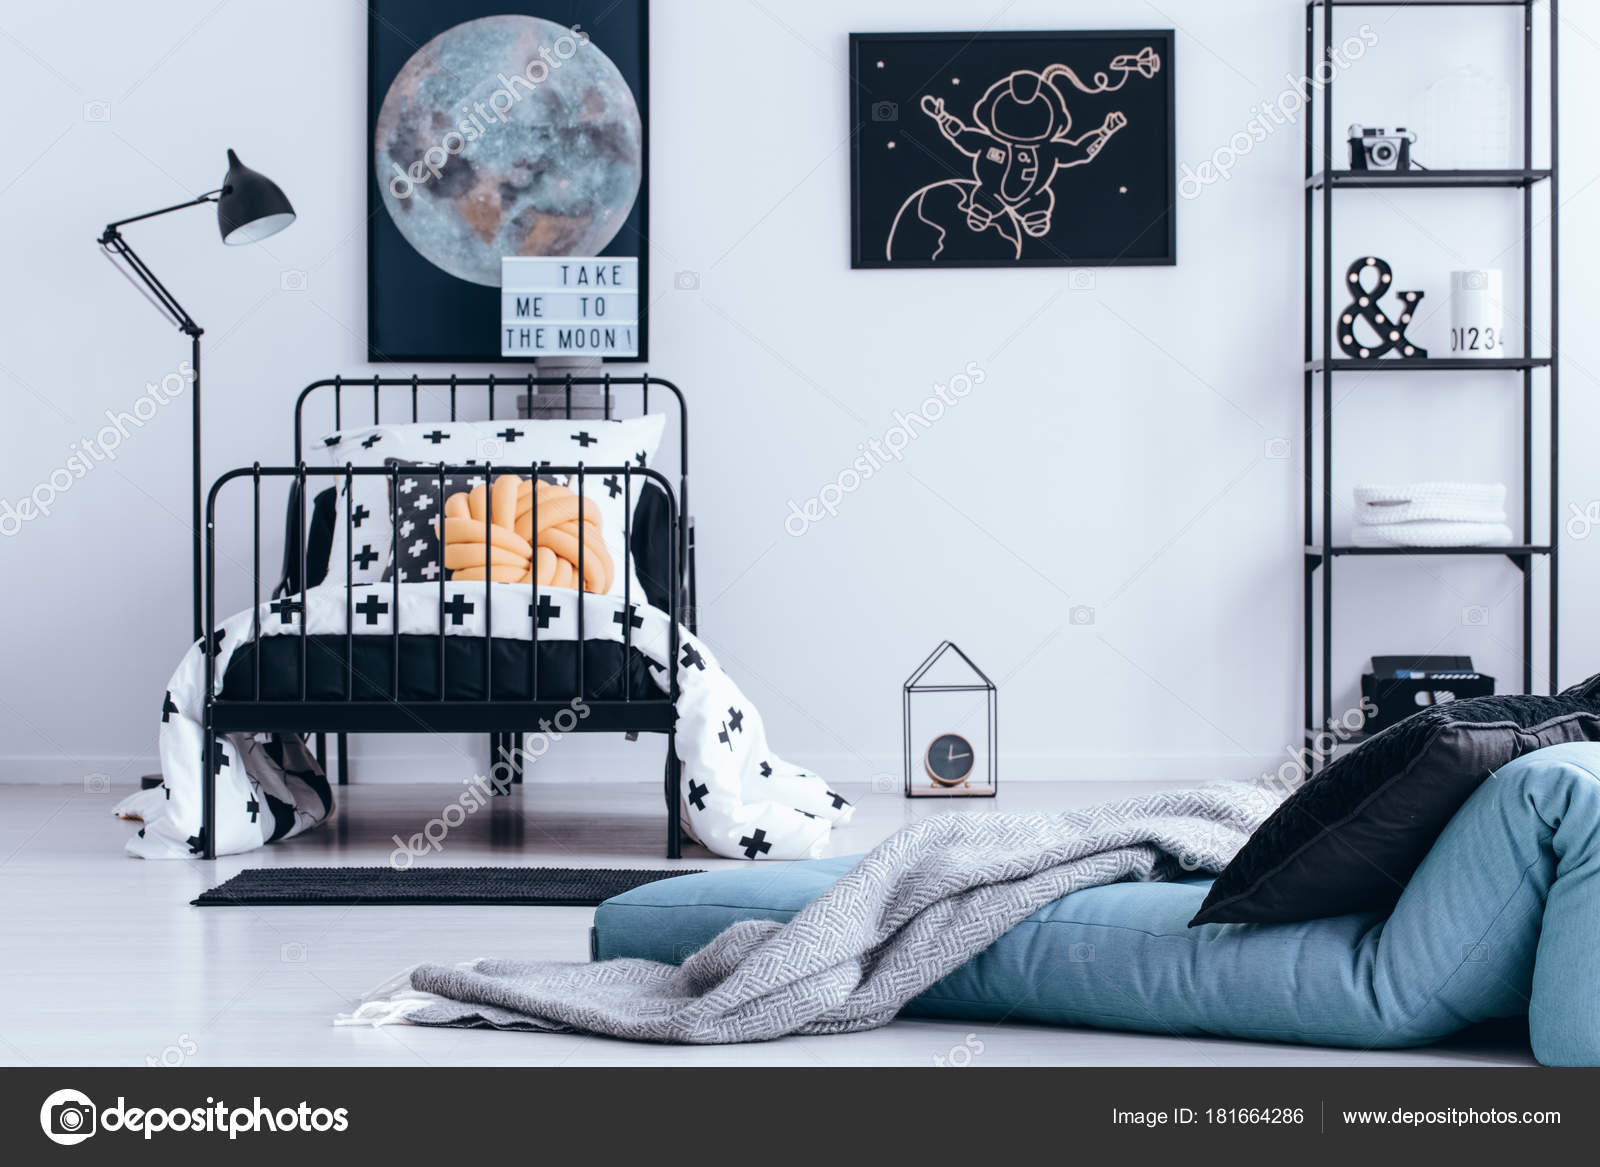 Astronaut Plakat Im Jugendzimmer U2014 Stockfoto